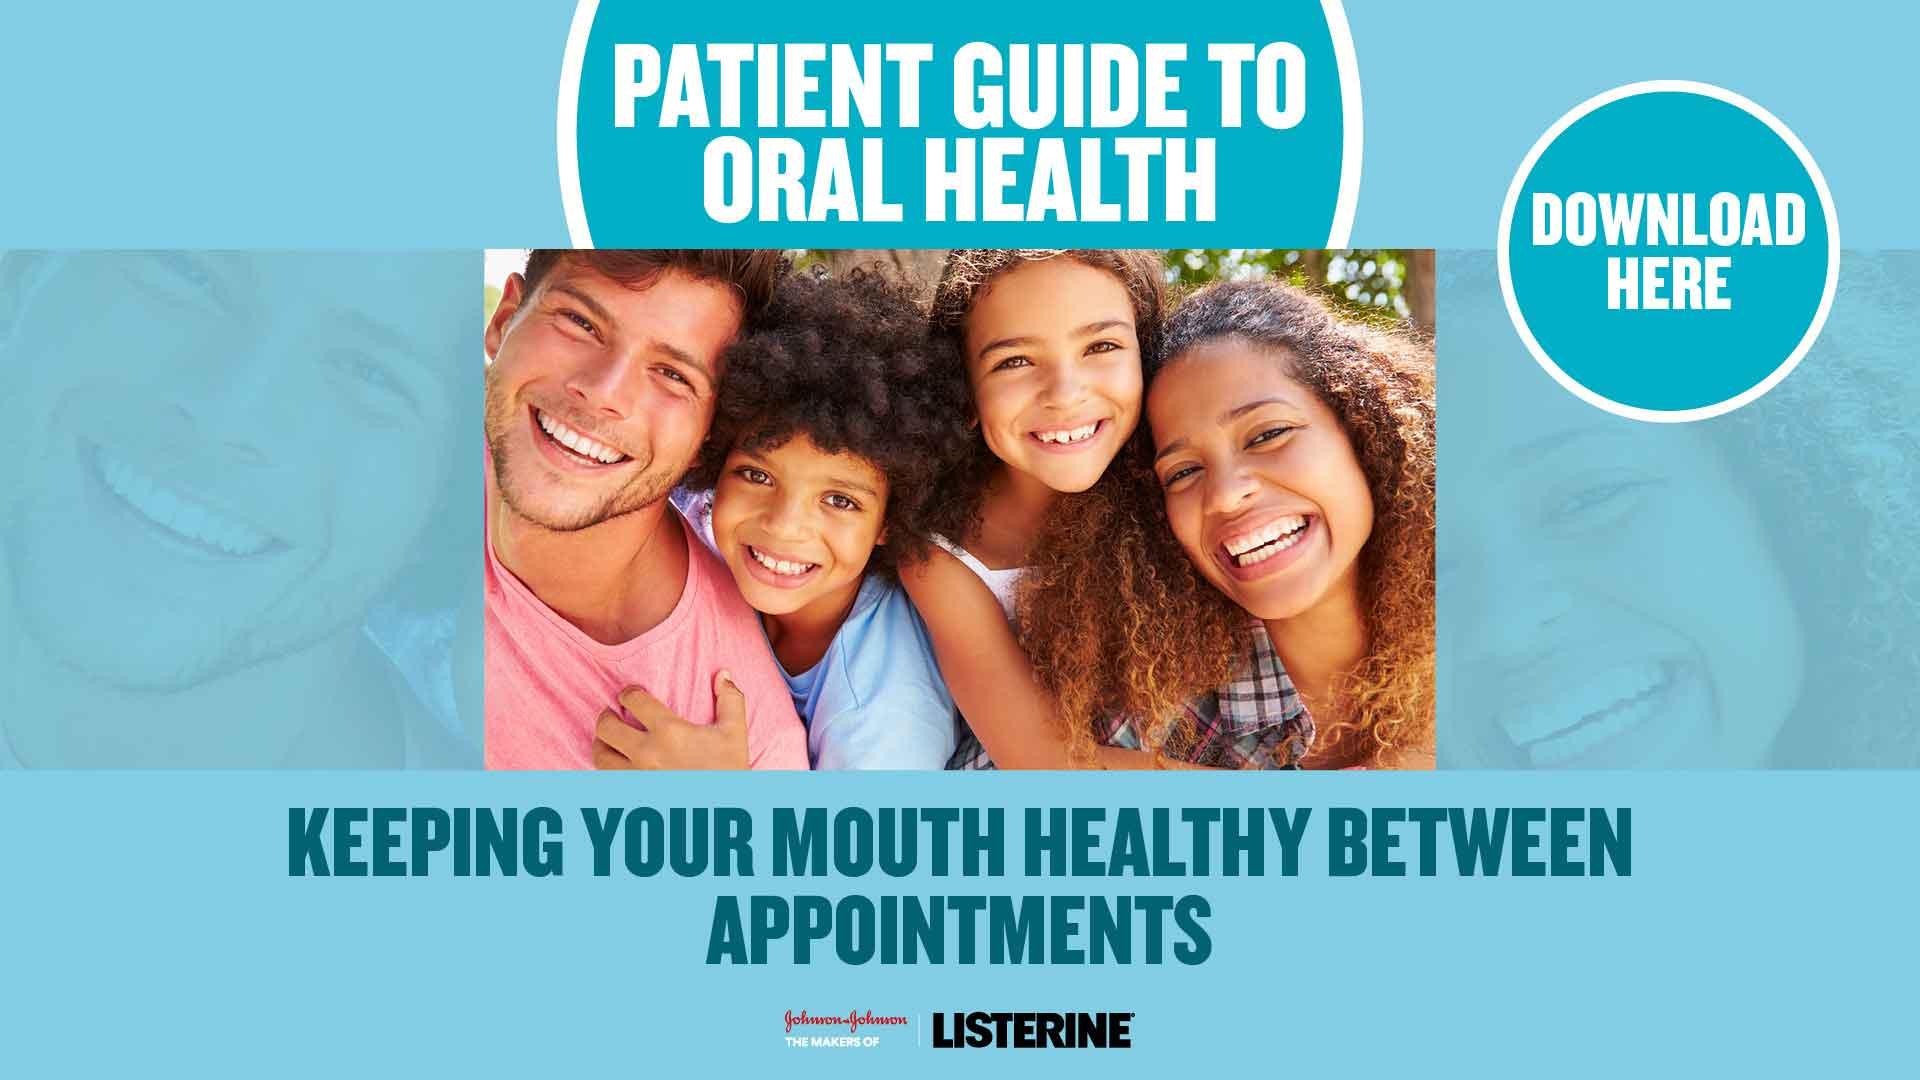 oral health Patient Guide